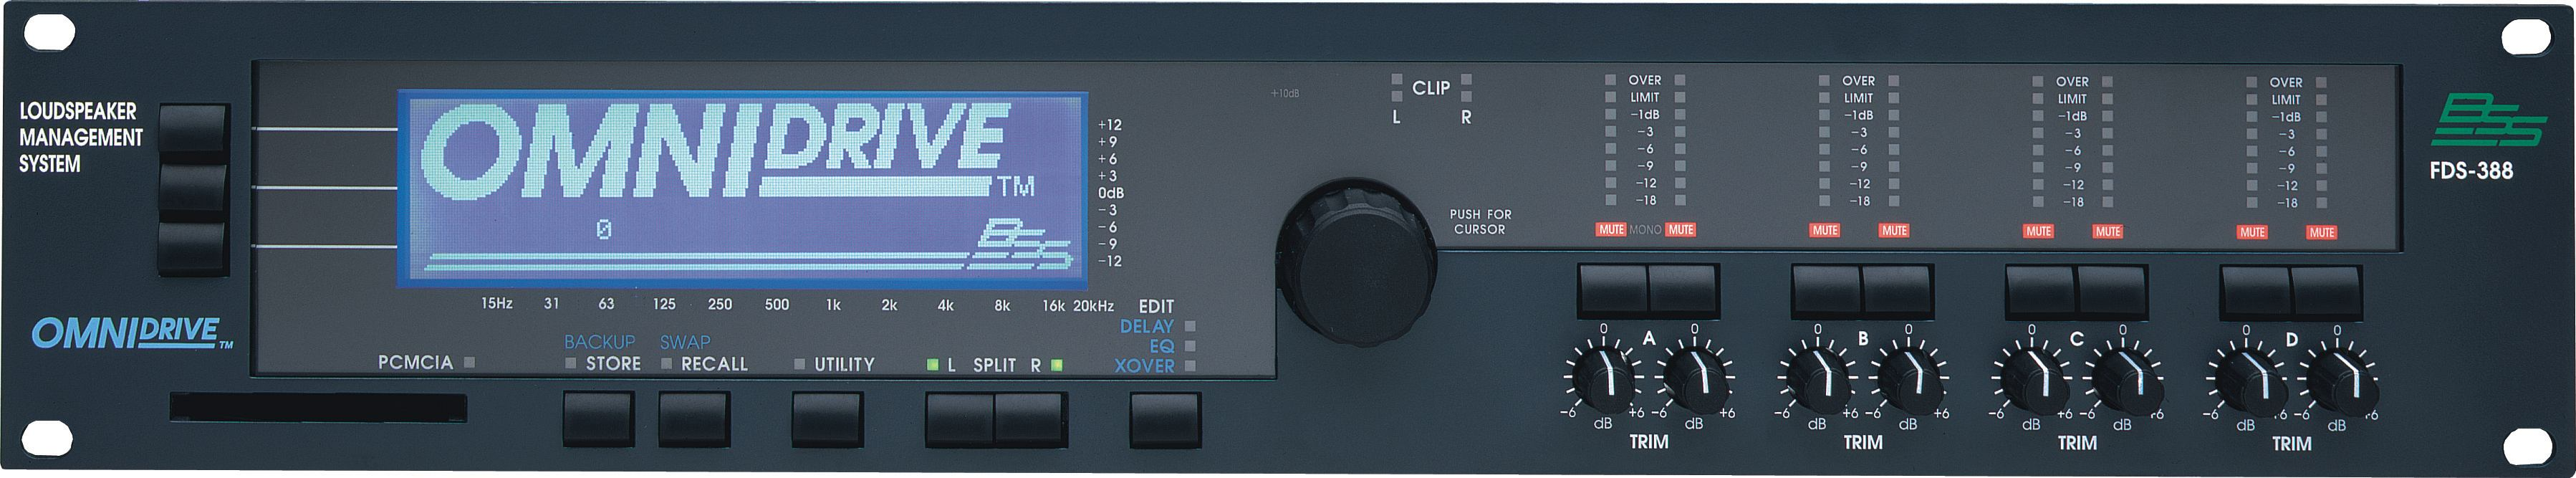 Fds 388 Omnidrive together with Horbert Un Lecteur Mp3 En Bois Pour Enfants 20120405 further Circuit Protection also Usb Power  lifier Circuit Ic Tda2822m additionally Total Divas 5017. on simple audio limiter